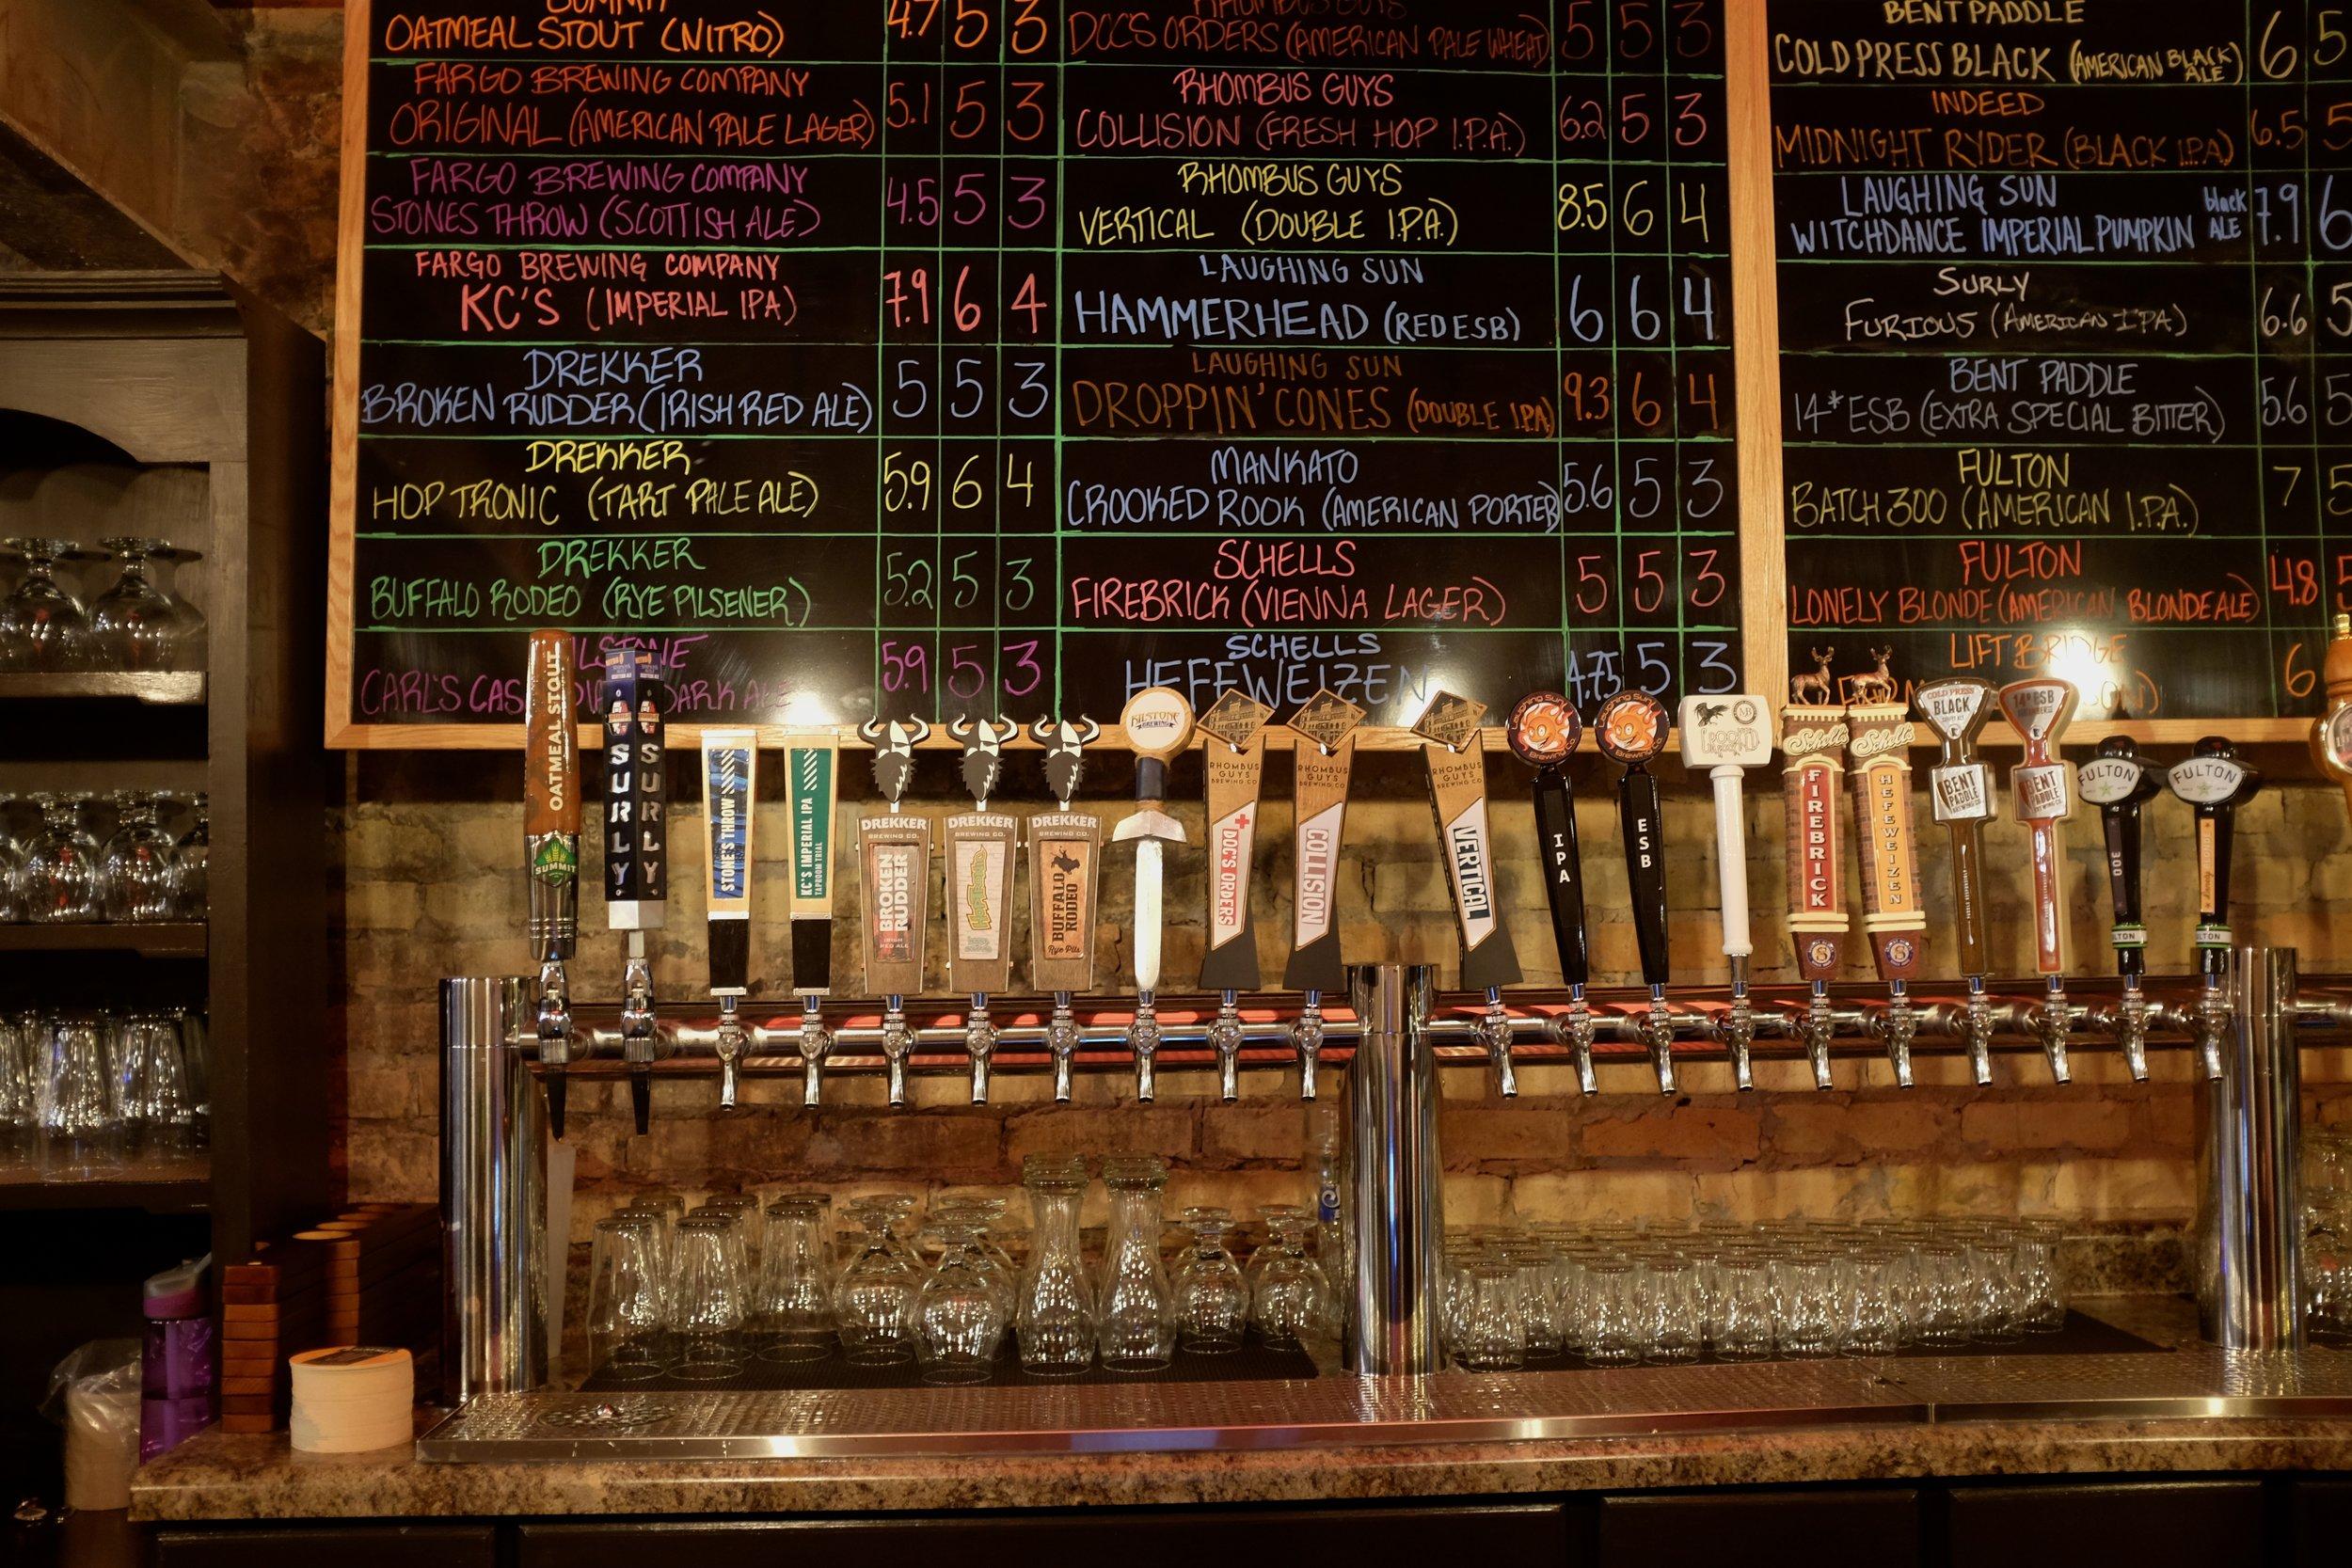 Front Street has 30 North Dakota and Minnesota beers on tap